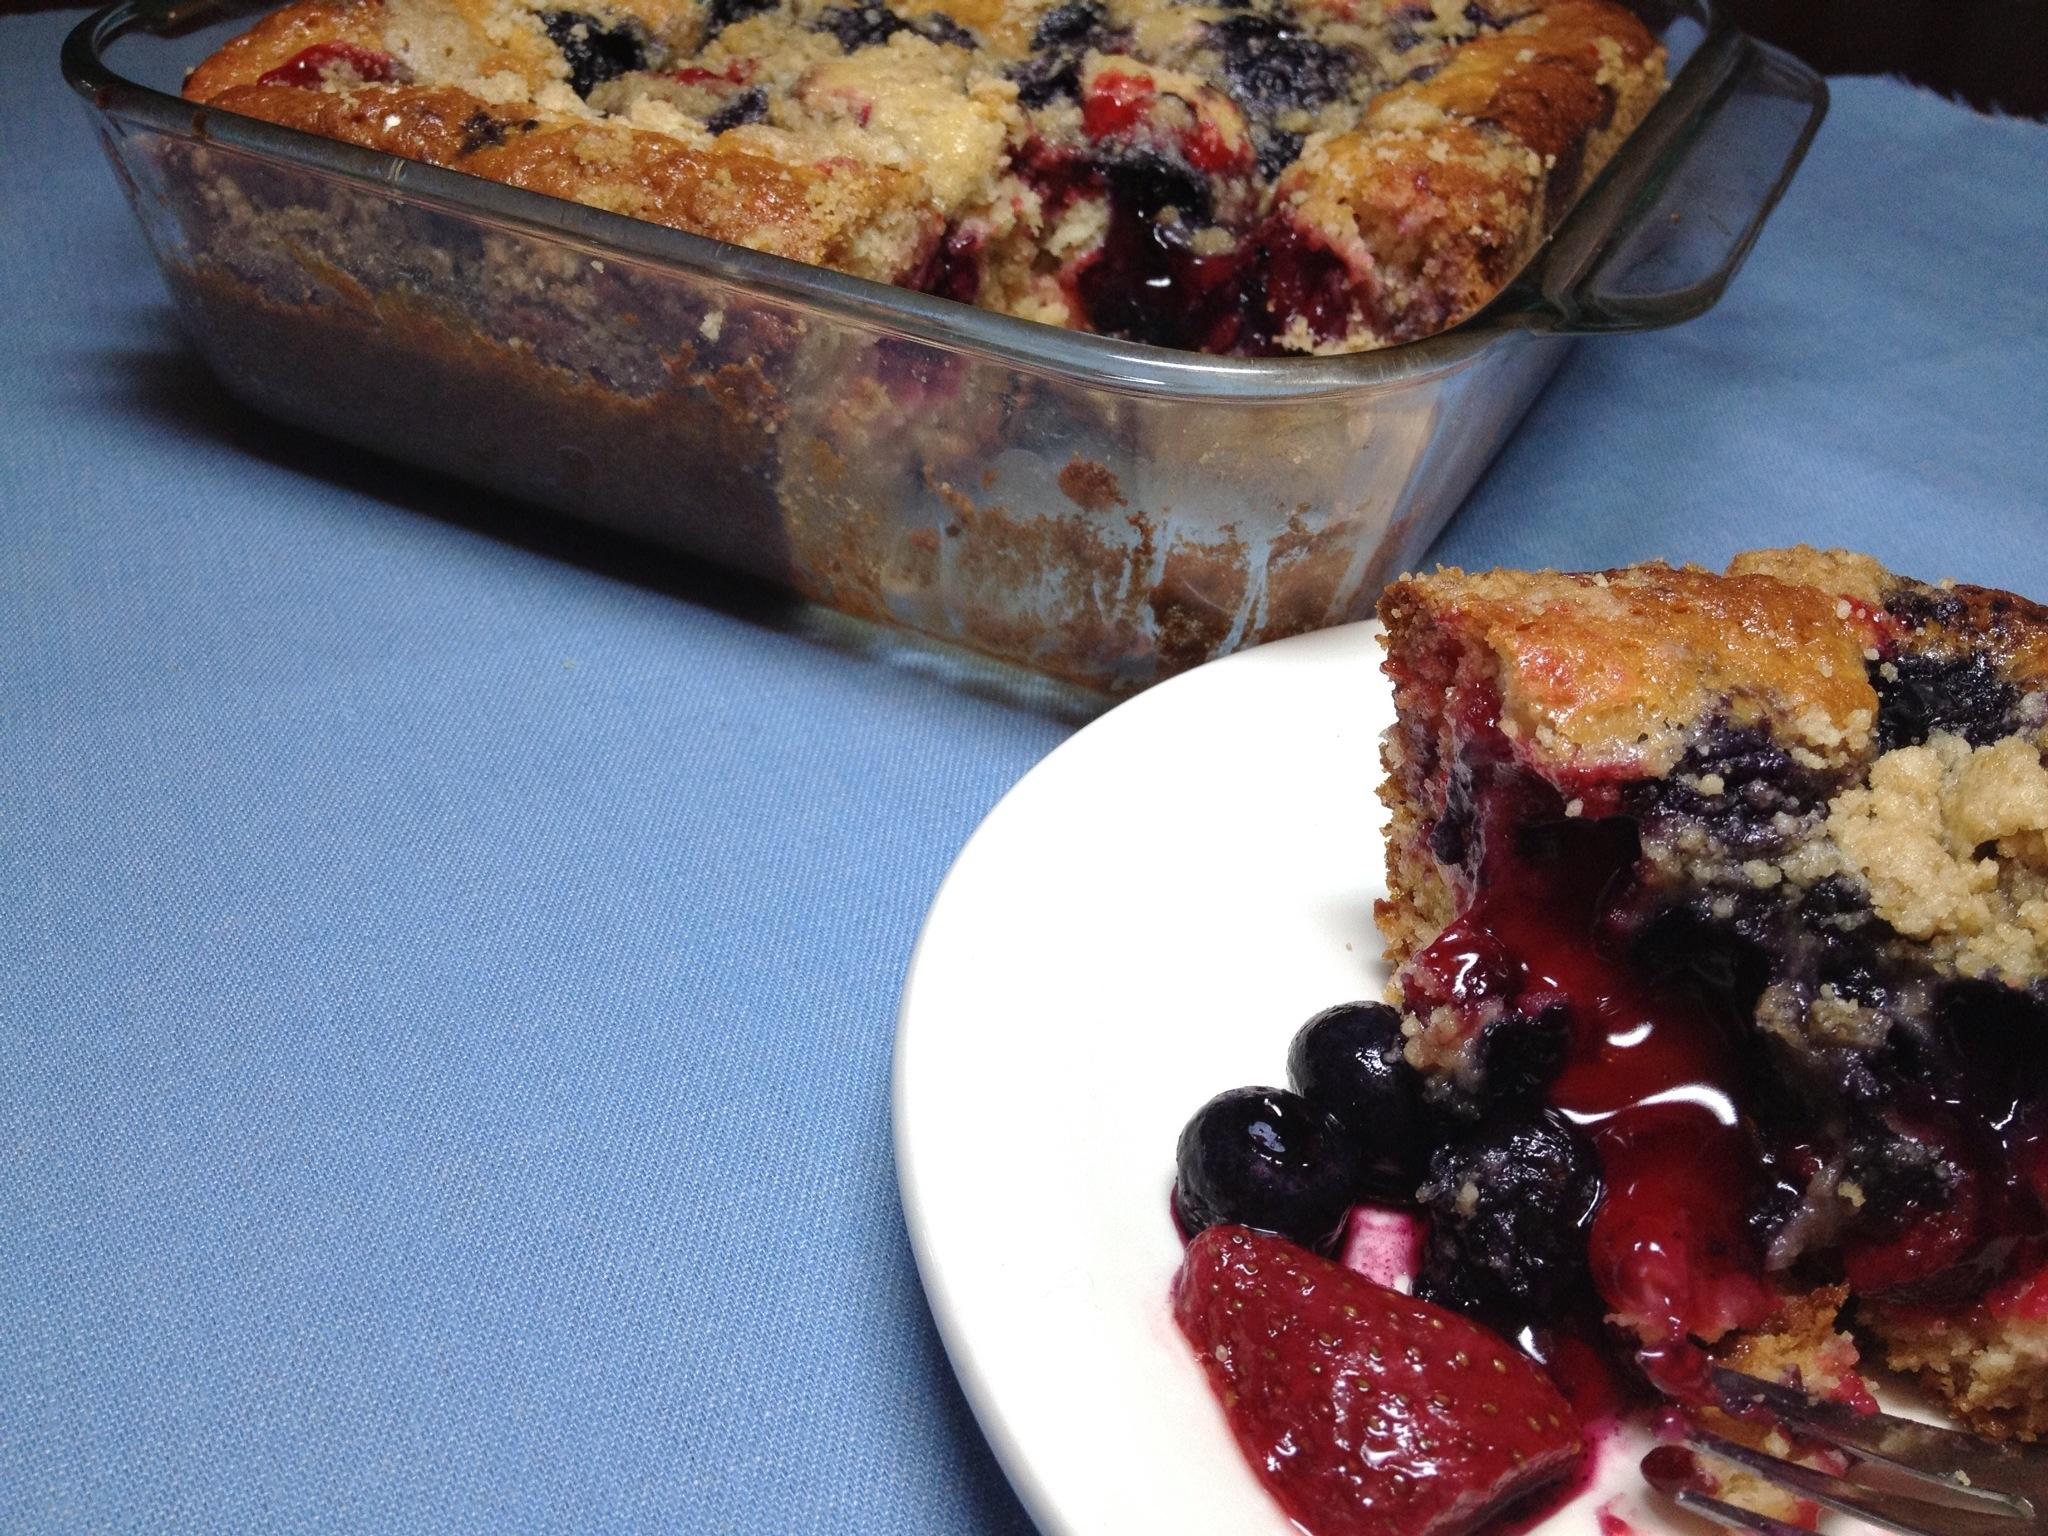 Berry Cheesecake Amish Friendship Bread by Paula Altenbach | friedshipbreadkitchen.com